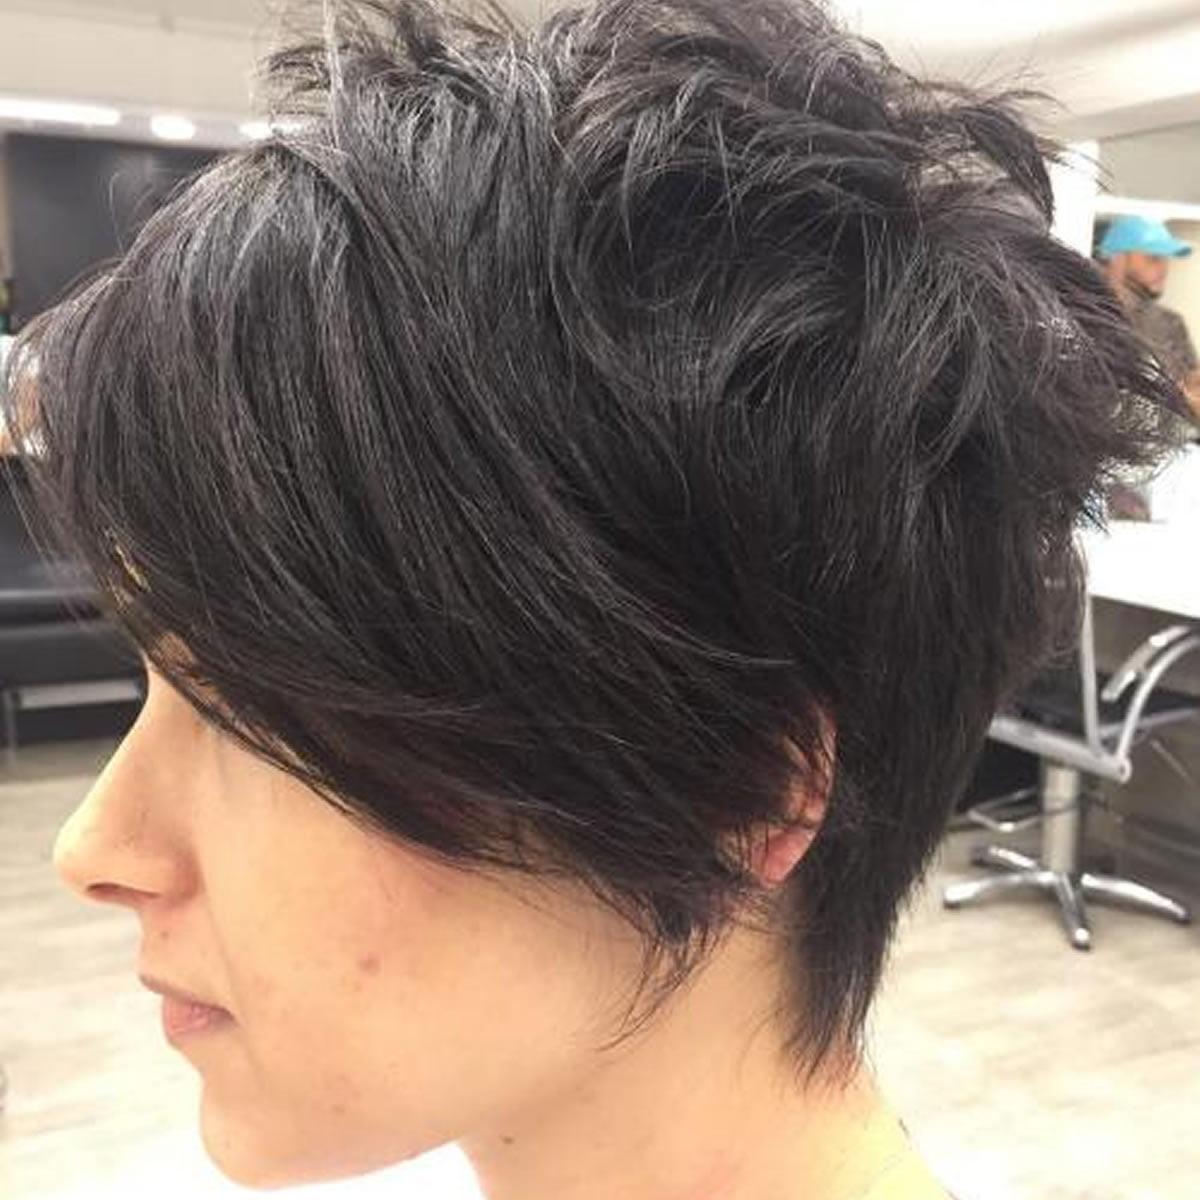 messy short pixie cut